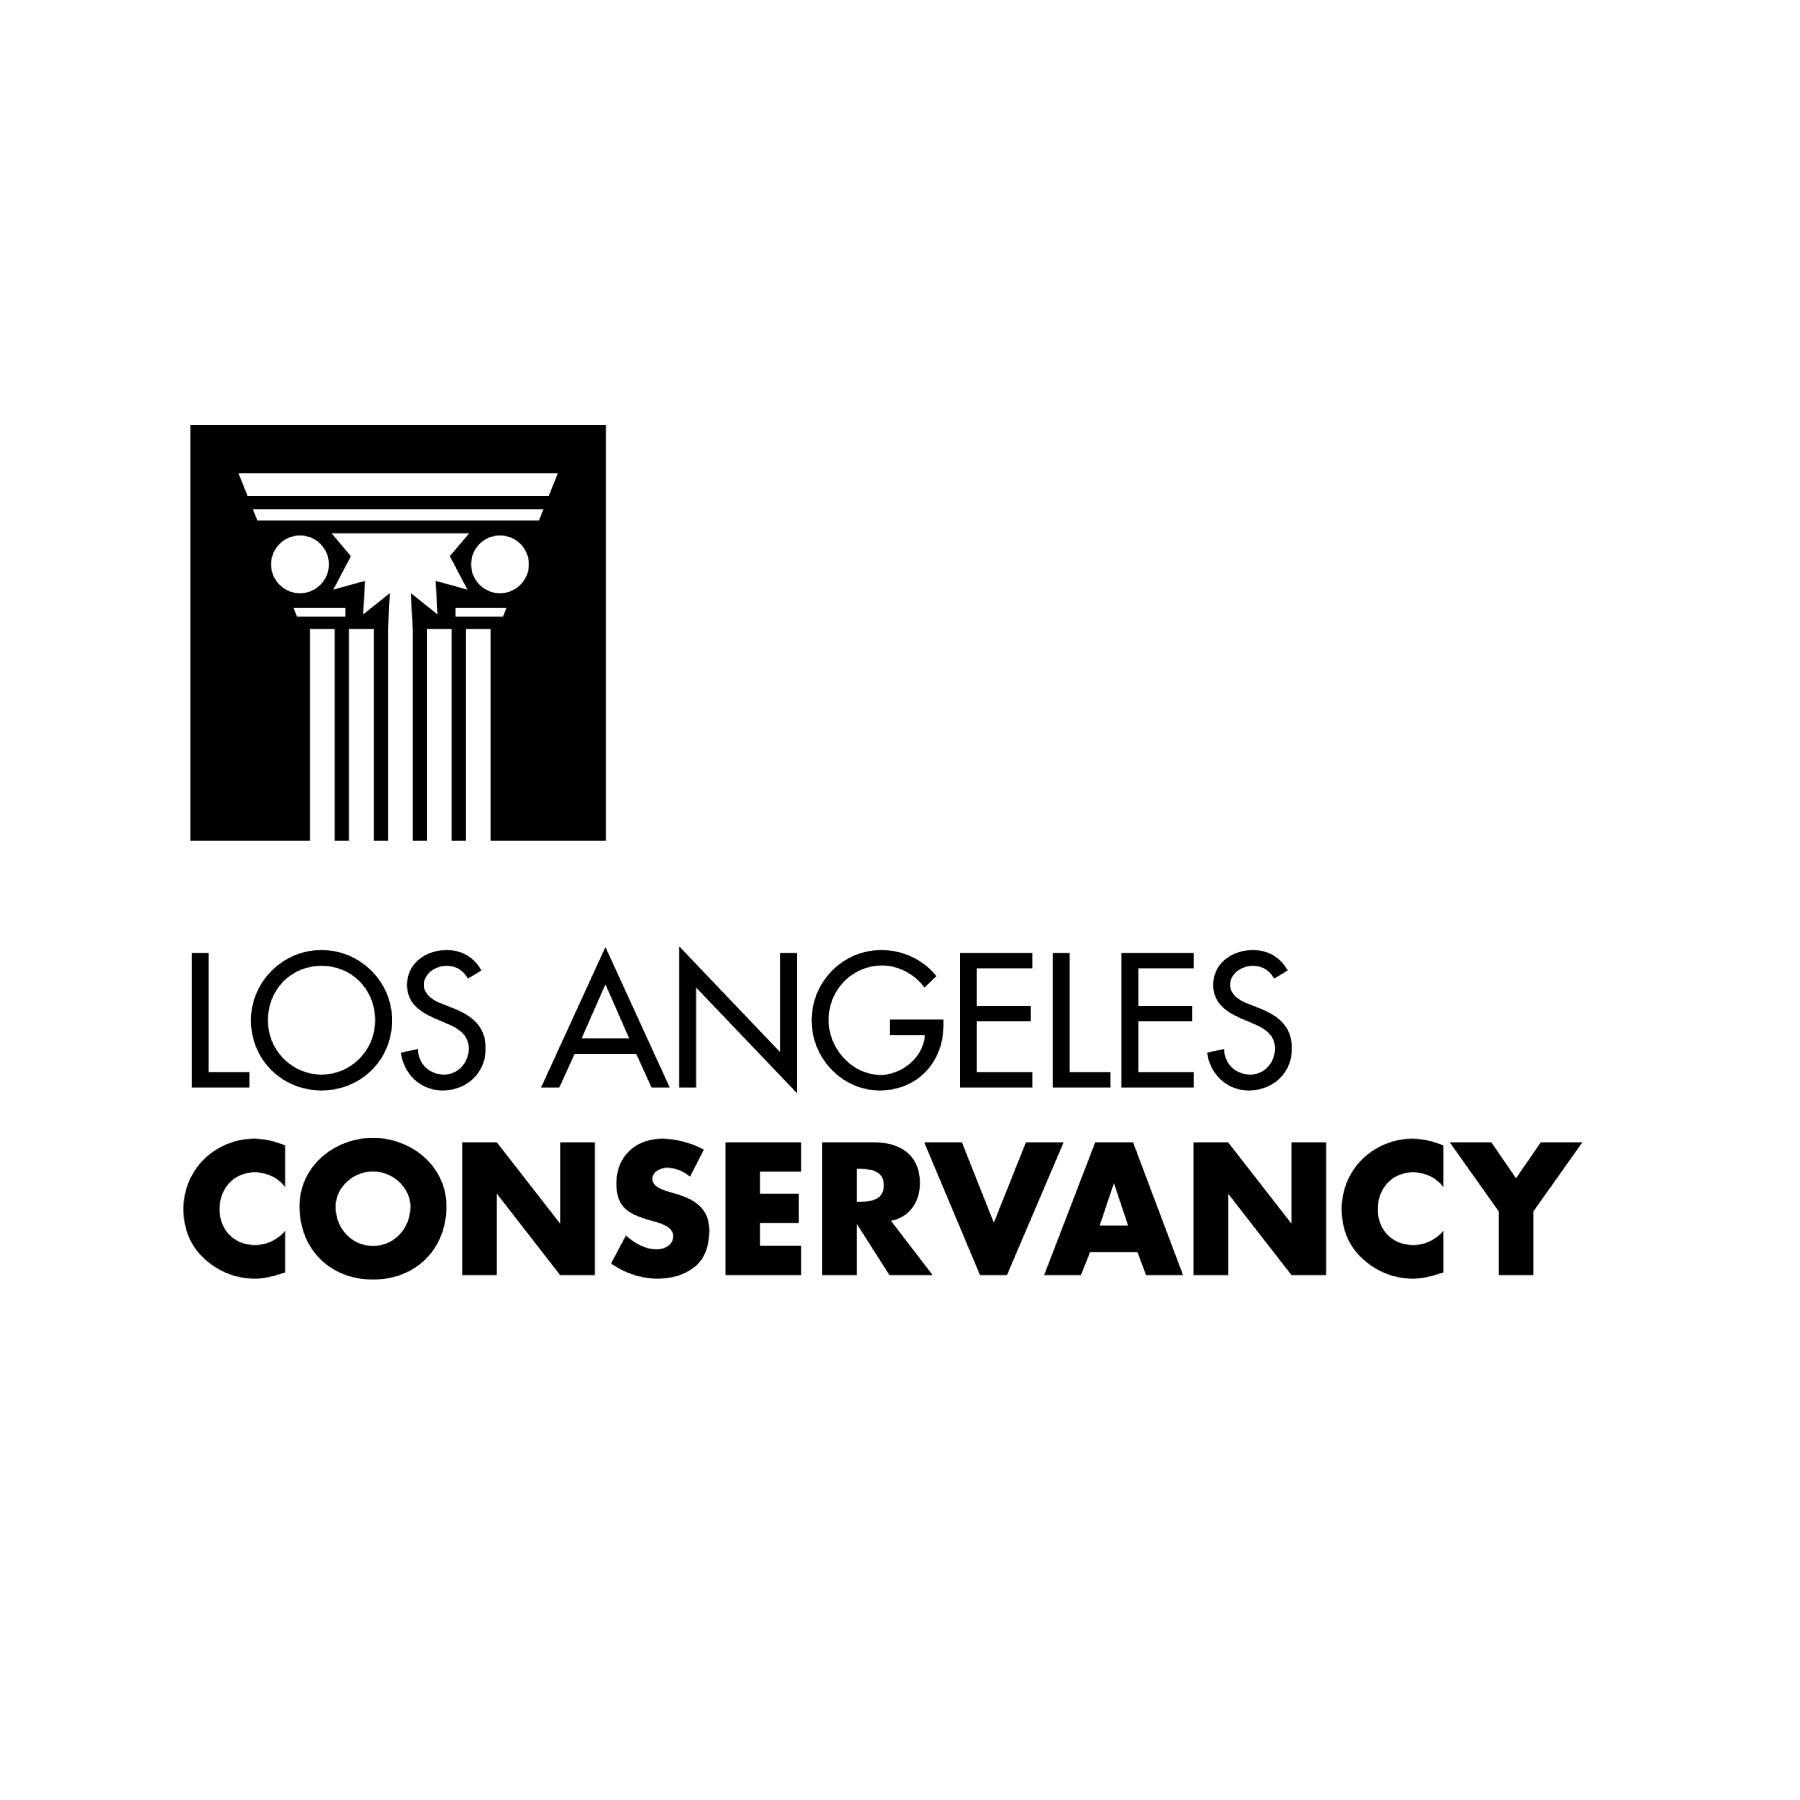 Los Angeles Conservancy